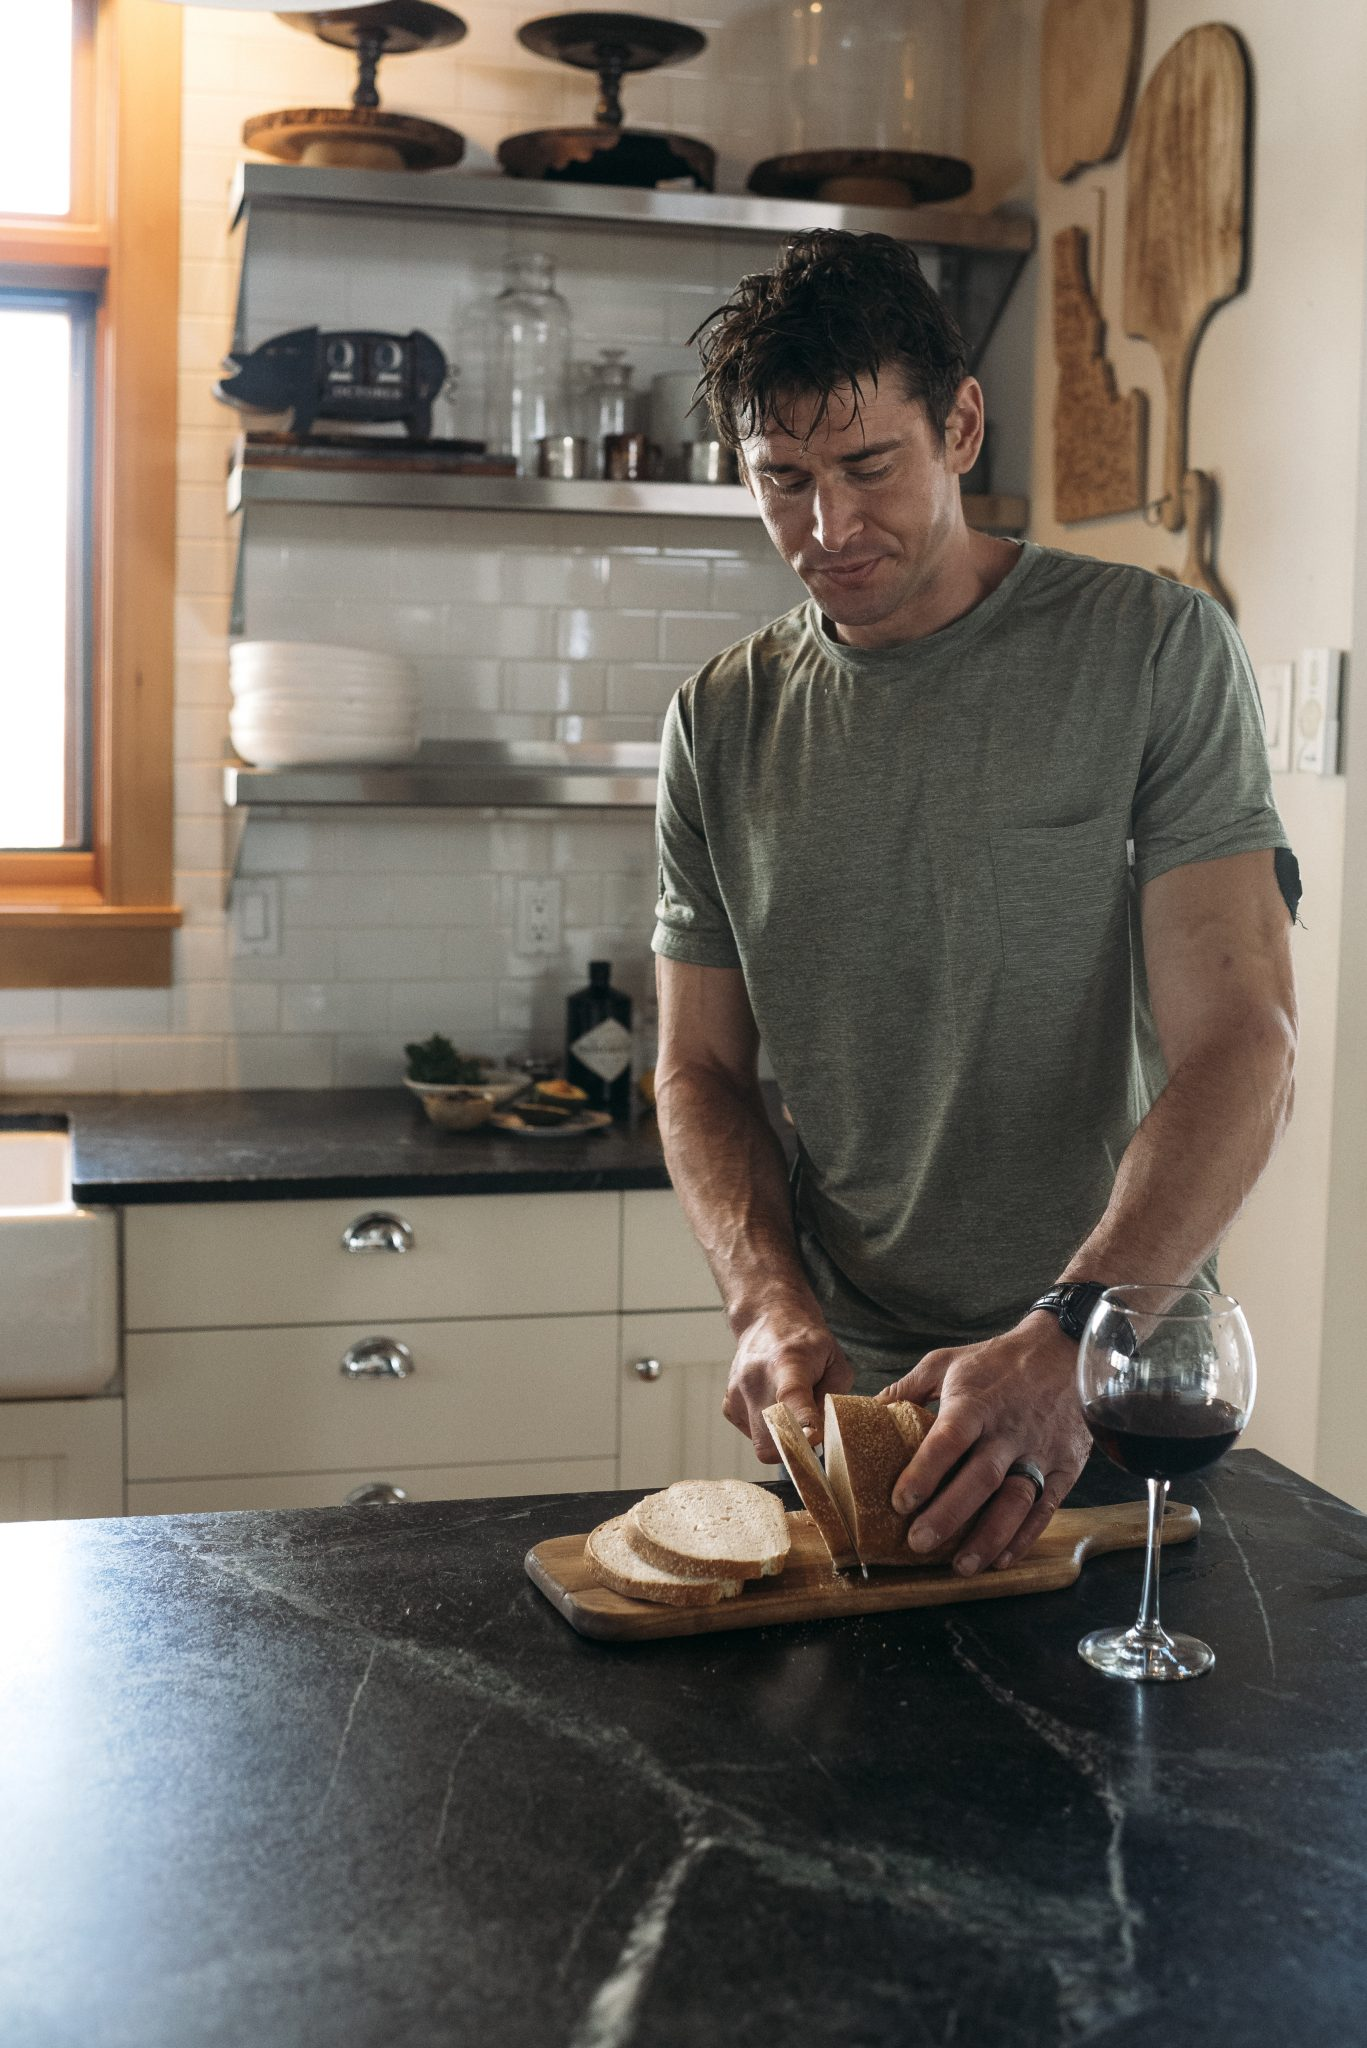 Ben cutting bread